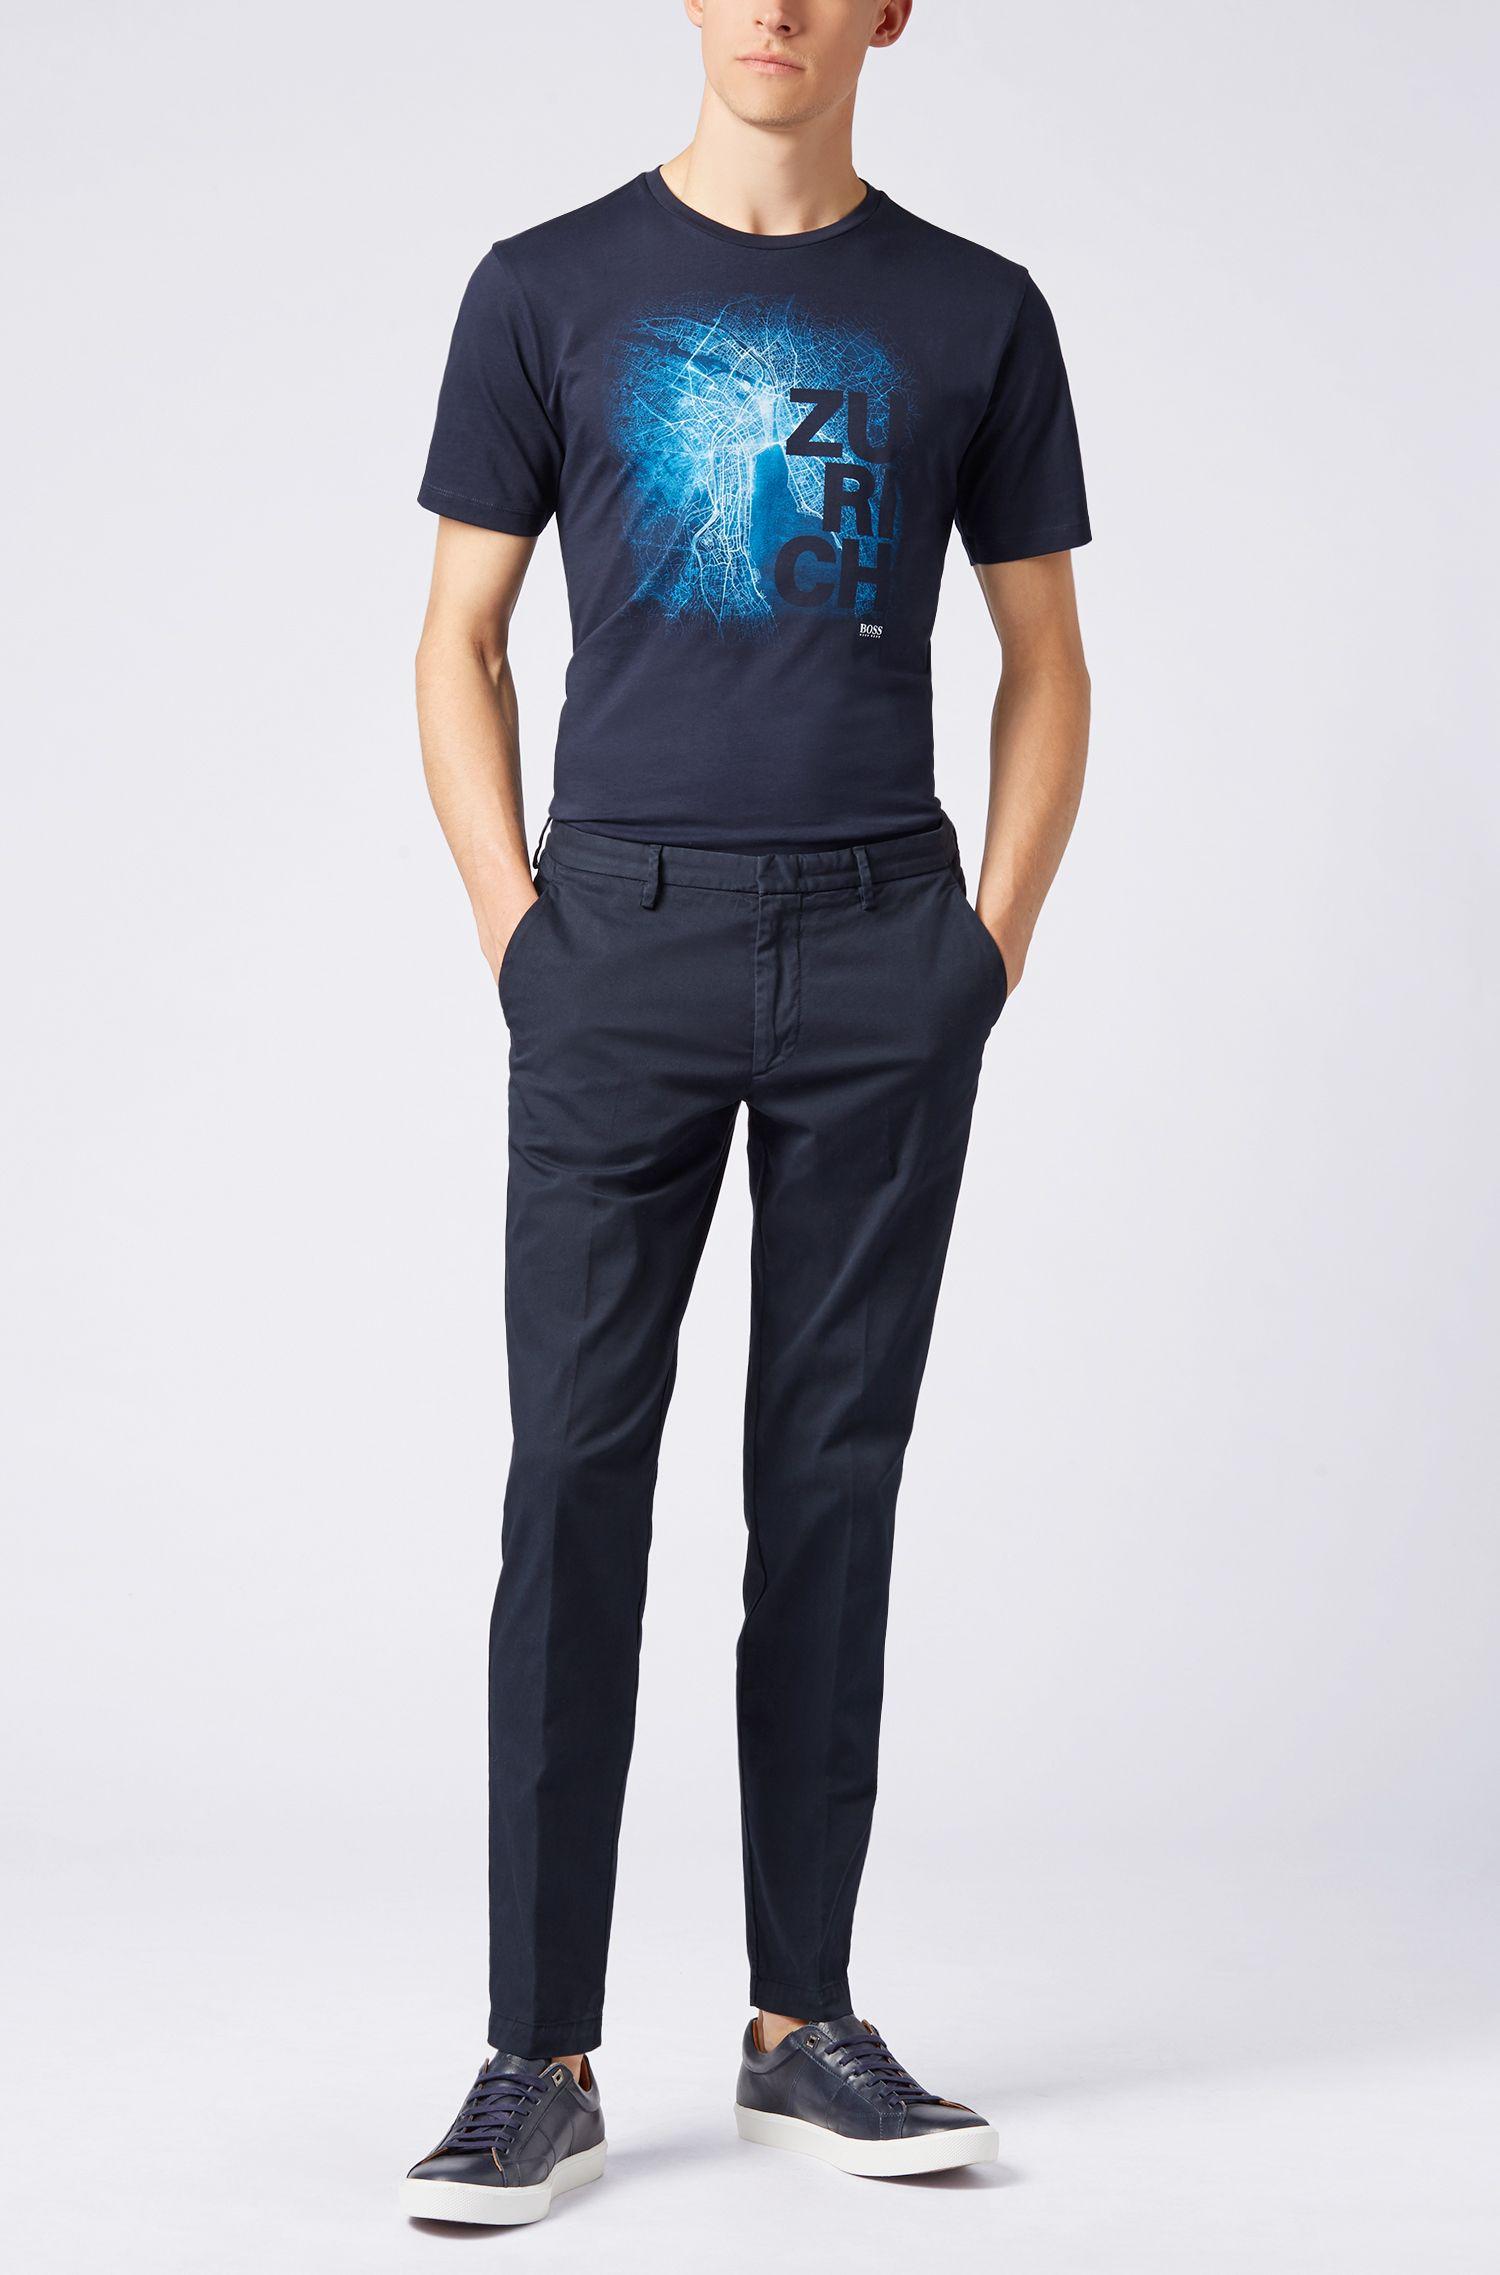 Limited Edition FormelE T-Shirt mit Zürich-Print, Blau